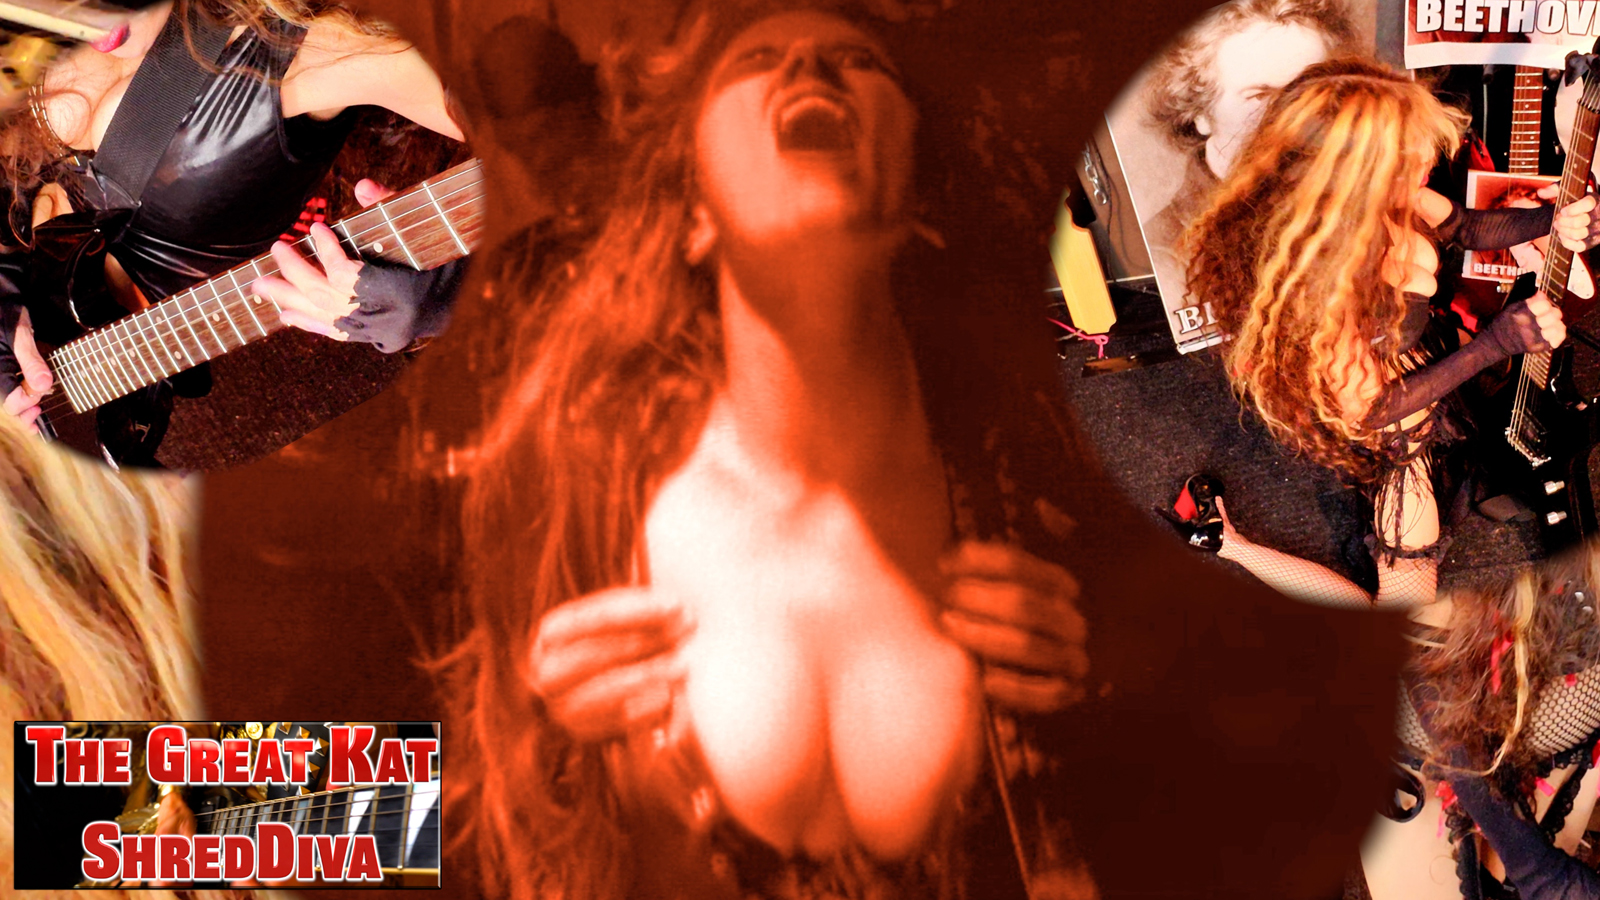 The Great Kat�s �SHREDDIVA� NEW RECORDING & MUSIC VIDEO � TERRIFIC/SHRED!